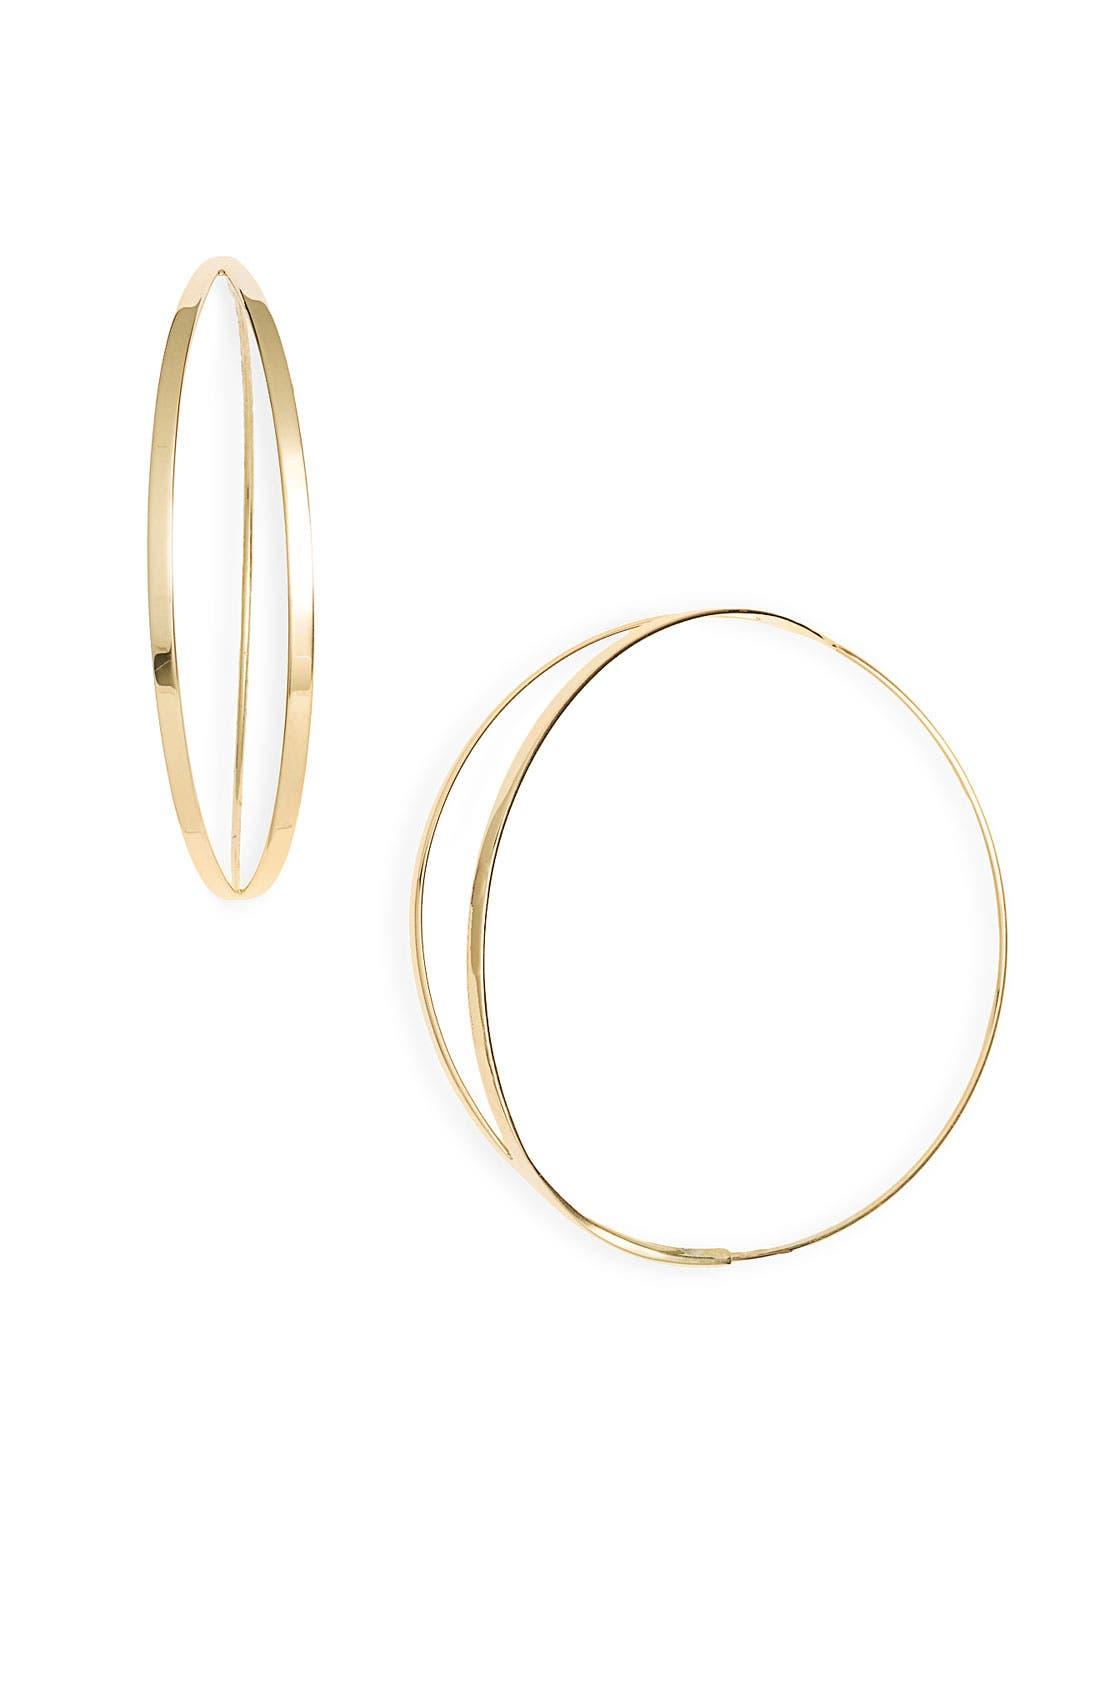 Alternate Image 1 Selected - Lana Jewelry 'Small Flirt' Hoop Earrings